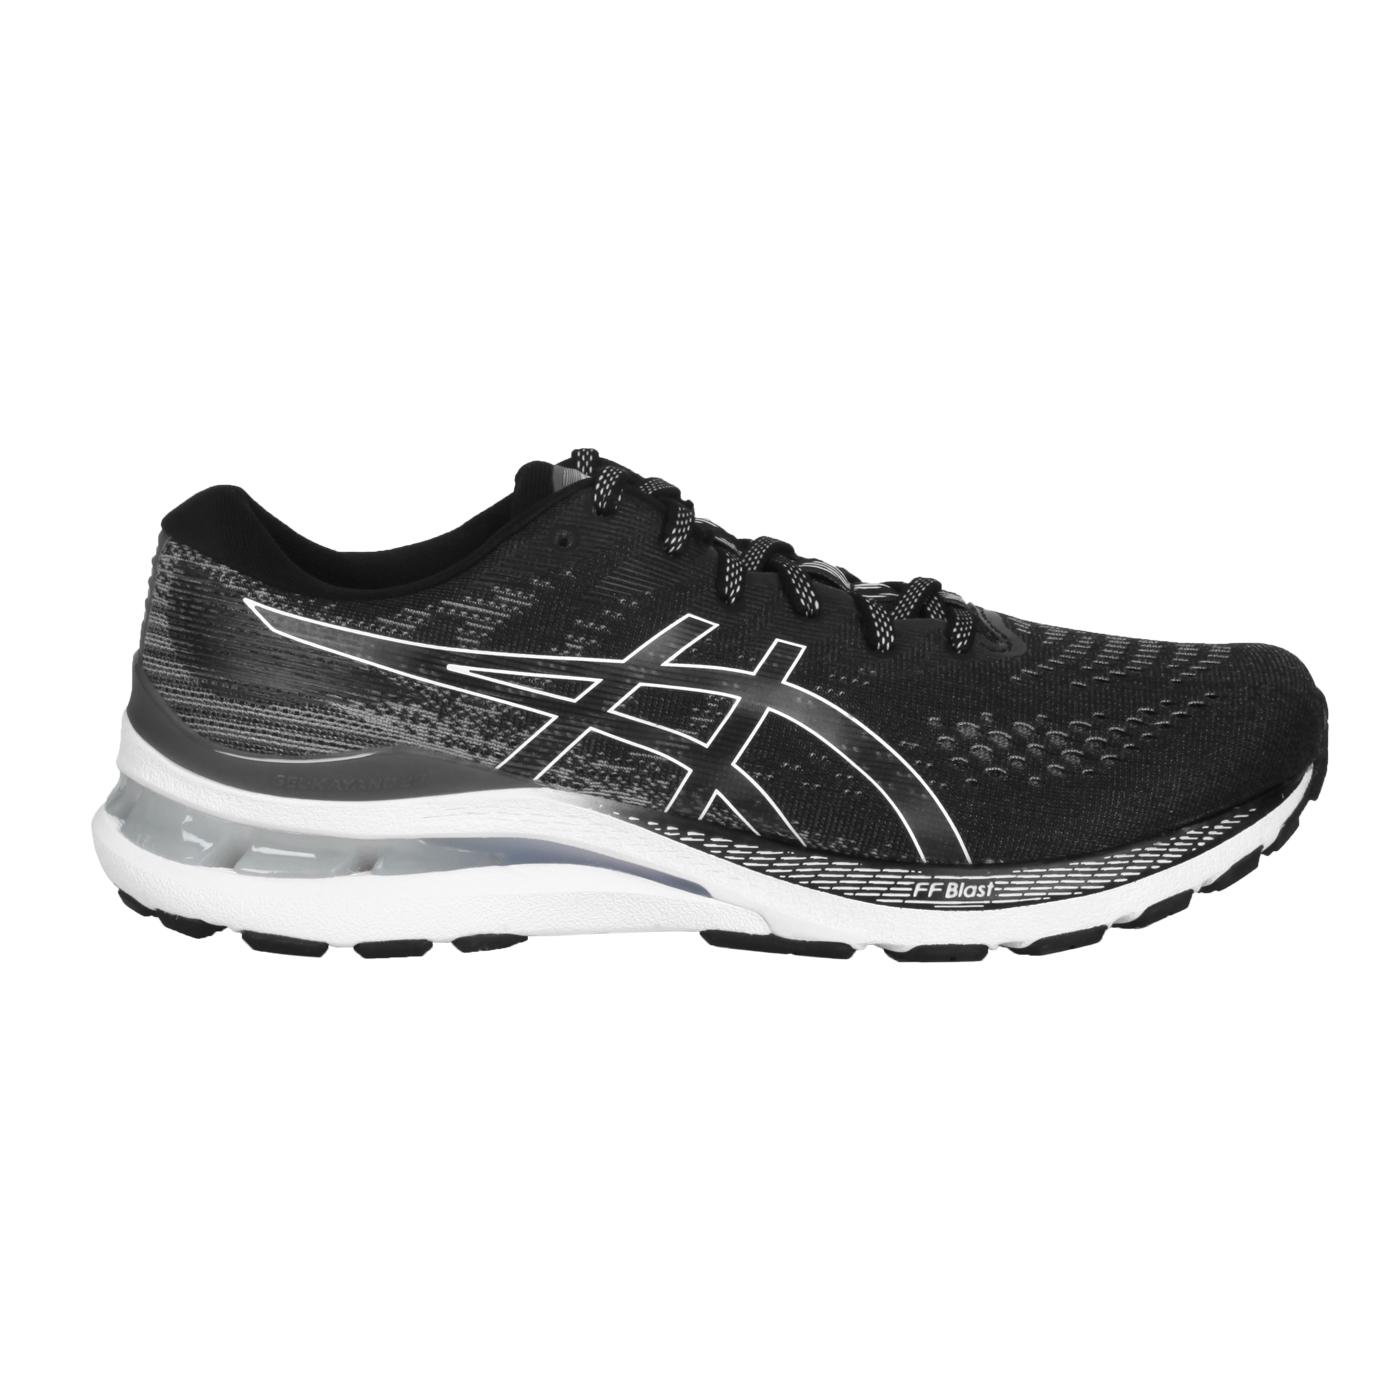 ASICS 男款慢跑鞋-2E  @GEL-KAYANO 28@1011B188-003 - 黑灰白